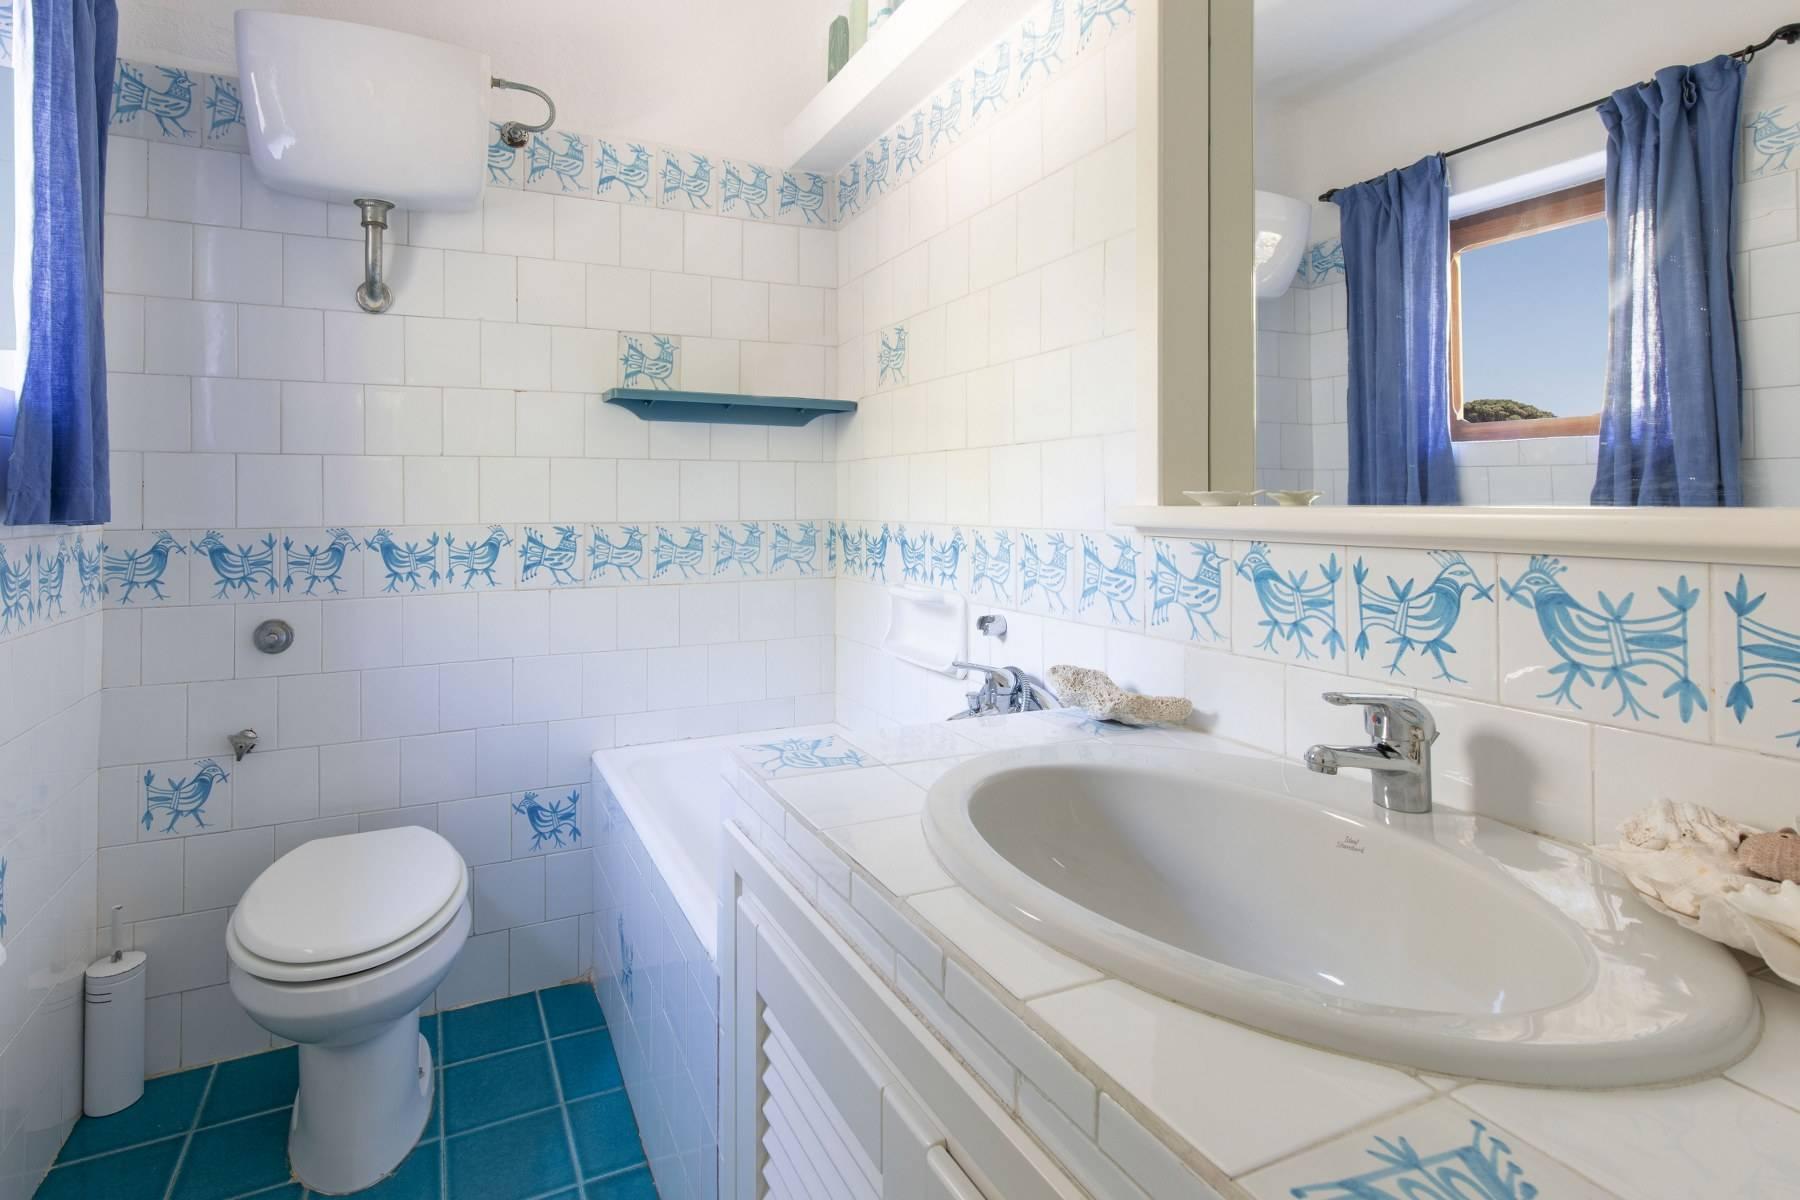 Appartamento in Vendita a Palau: 5 locali, 65 mq - Foto 21